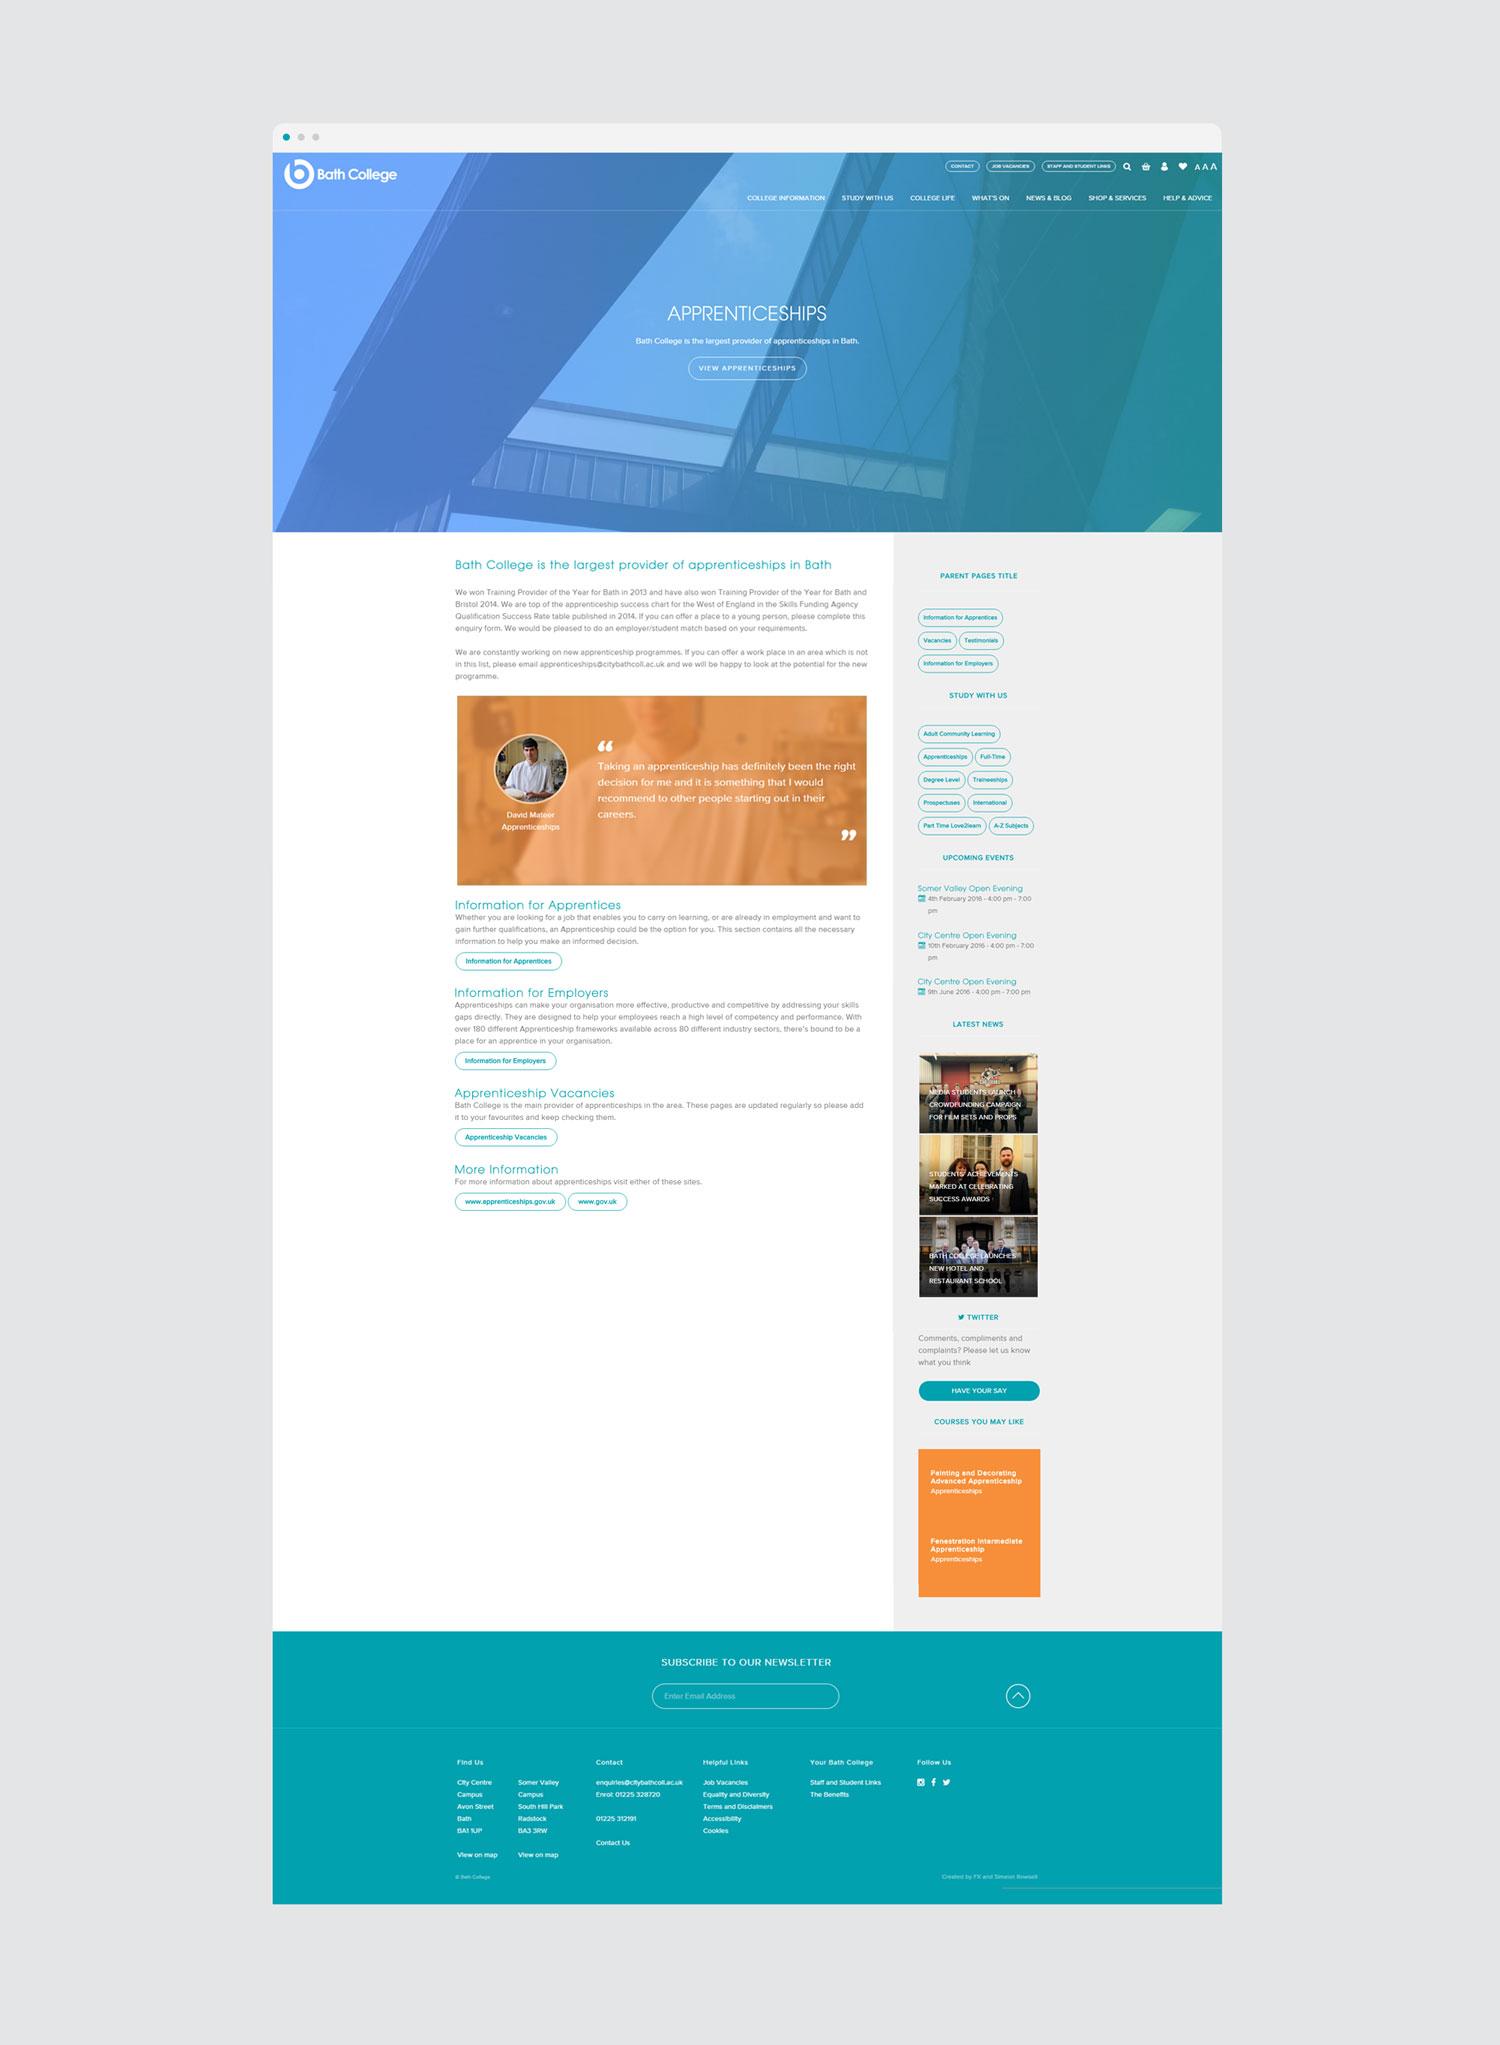 Web Design Courses Bristol